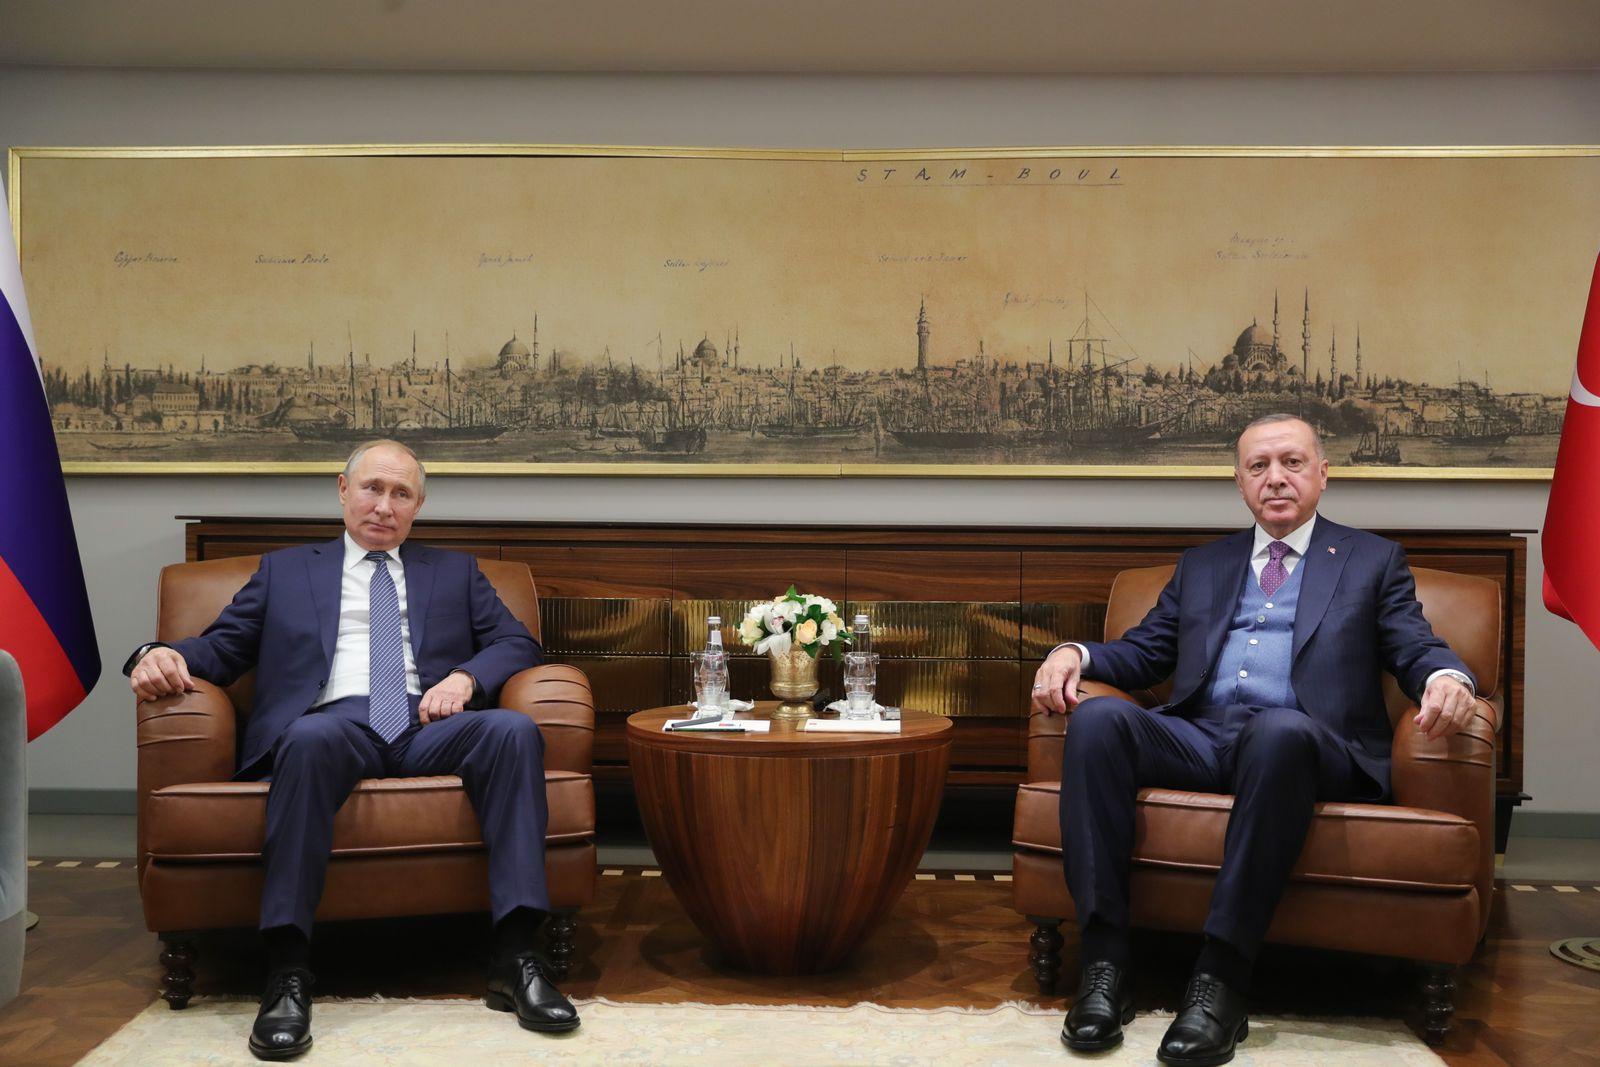 Russian President Vladimir Putin visits Turkey, Istanbul - 08 Jan 2020